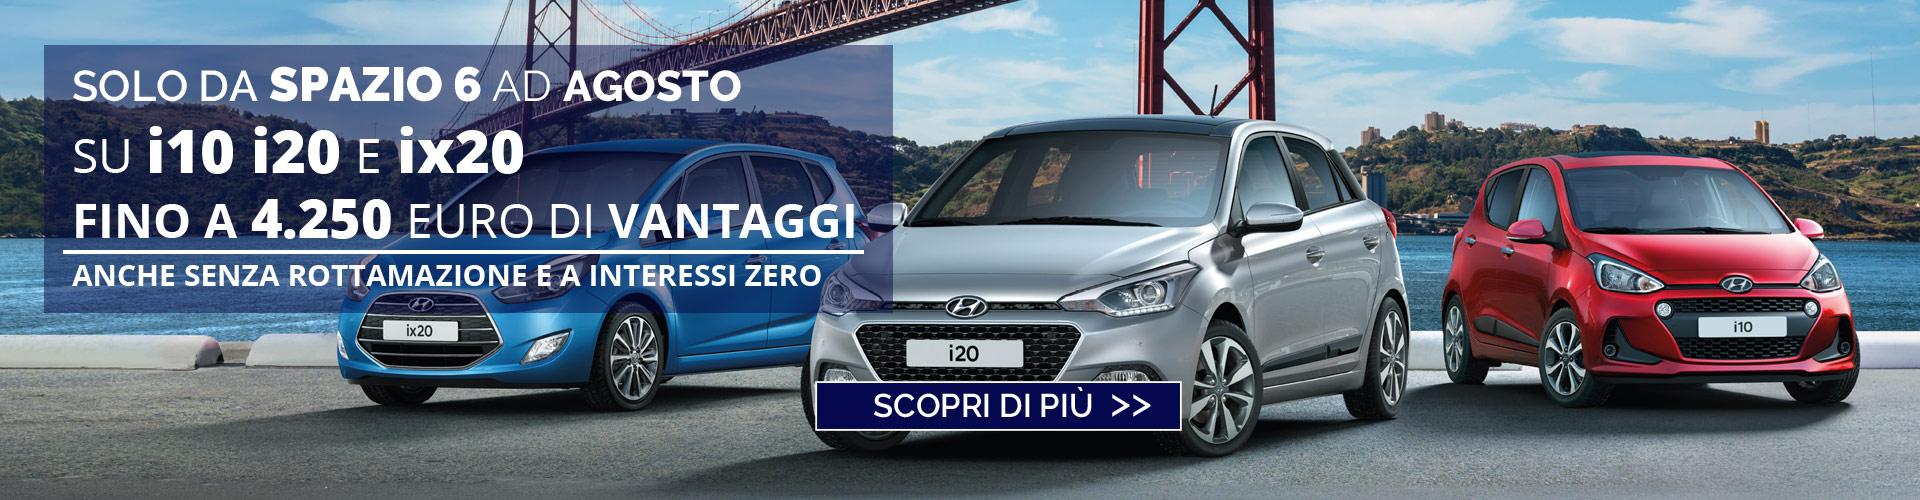 Hyundai City car Spazio 6 Torino